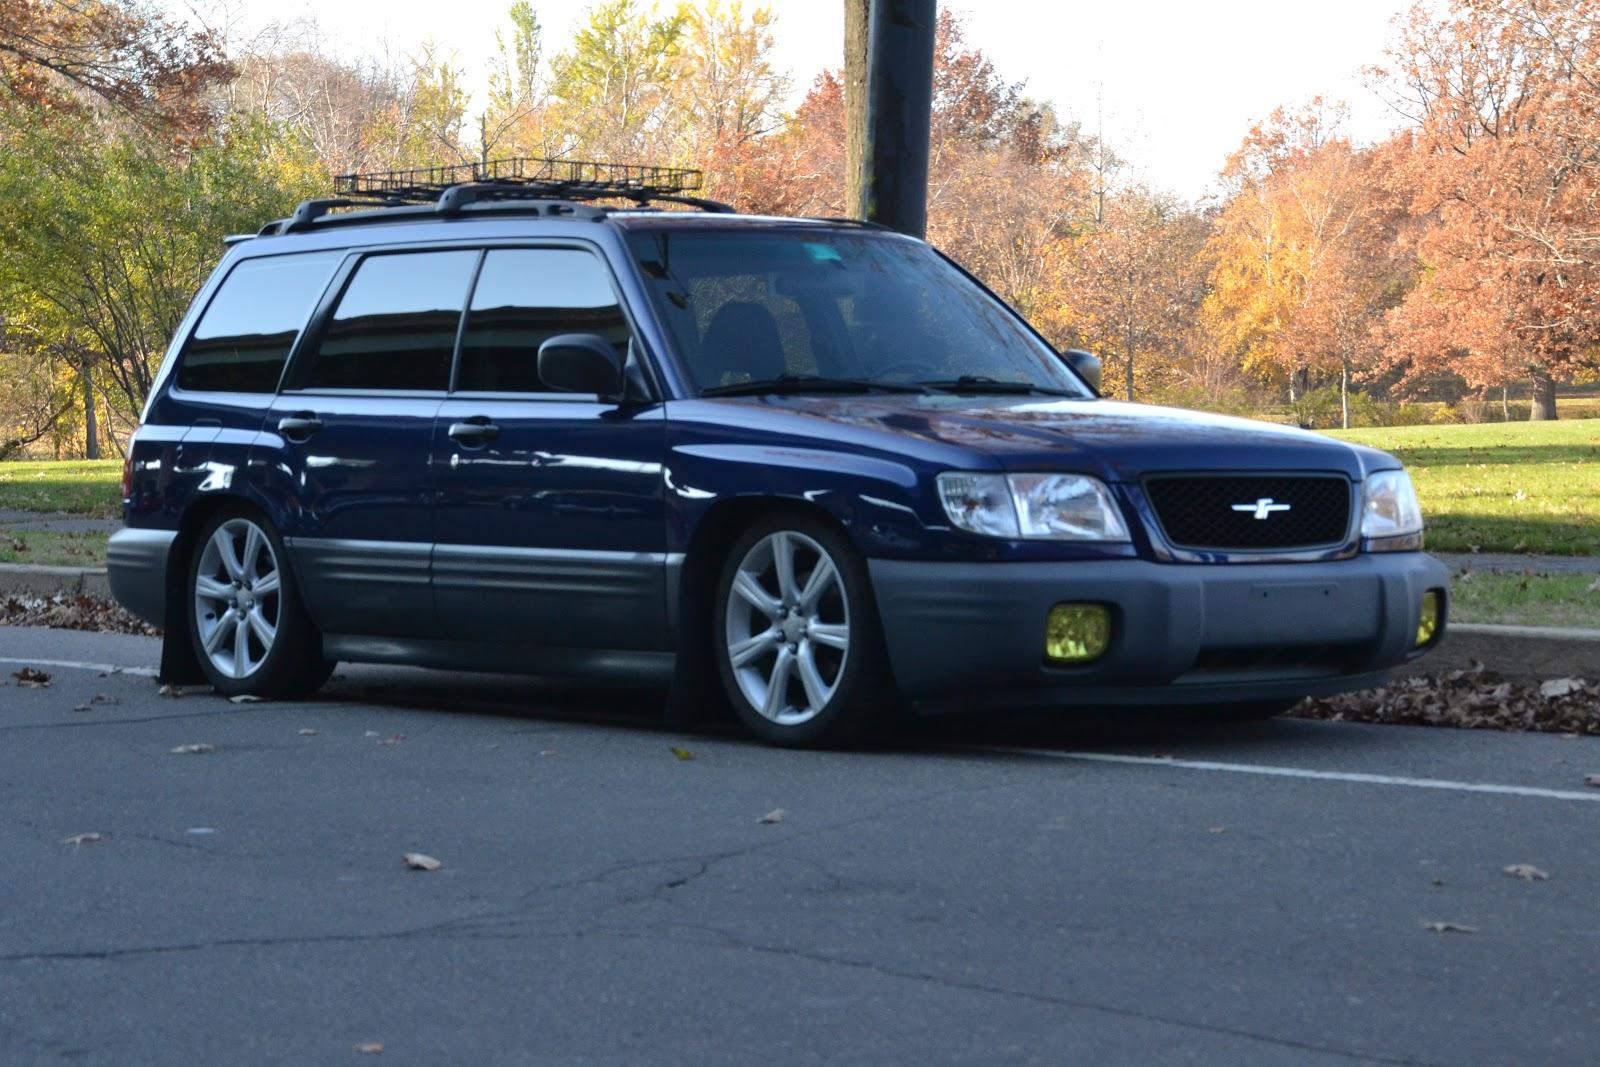 100 98 U002700 1998 Subaru Forester Lifted